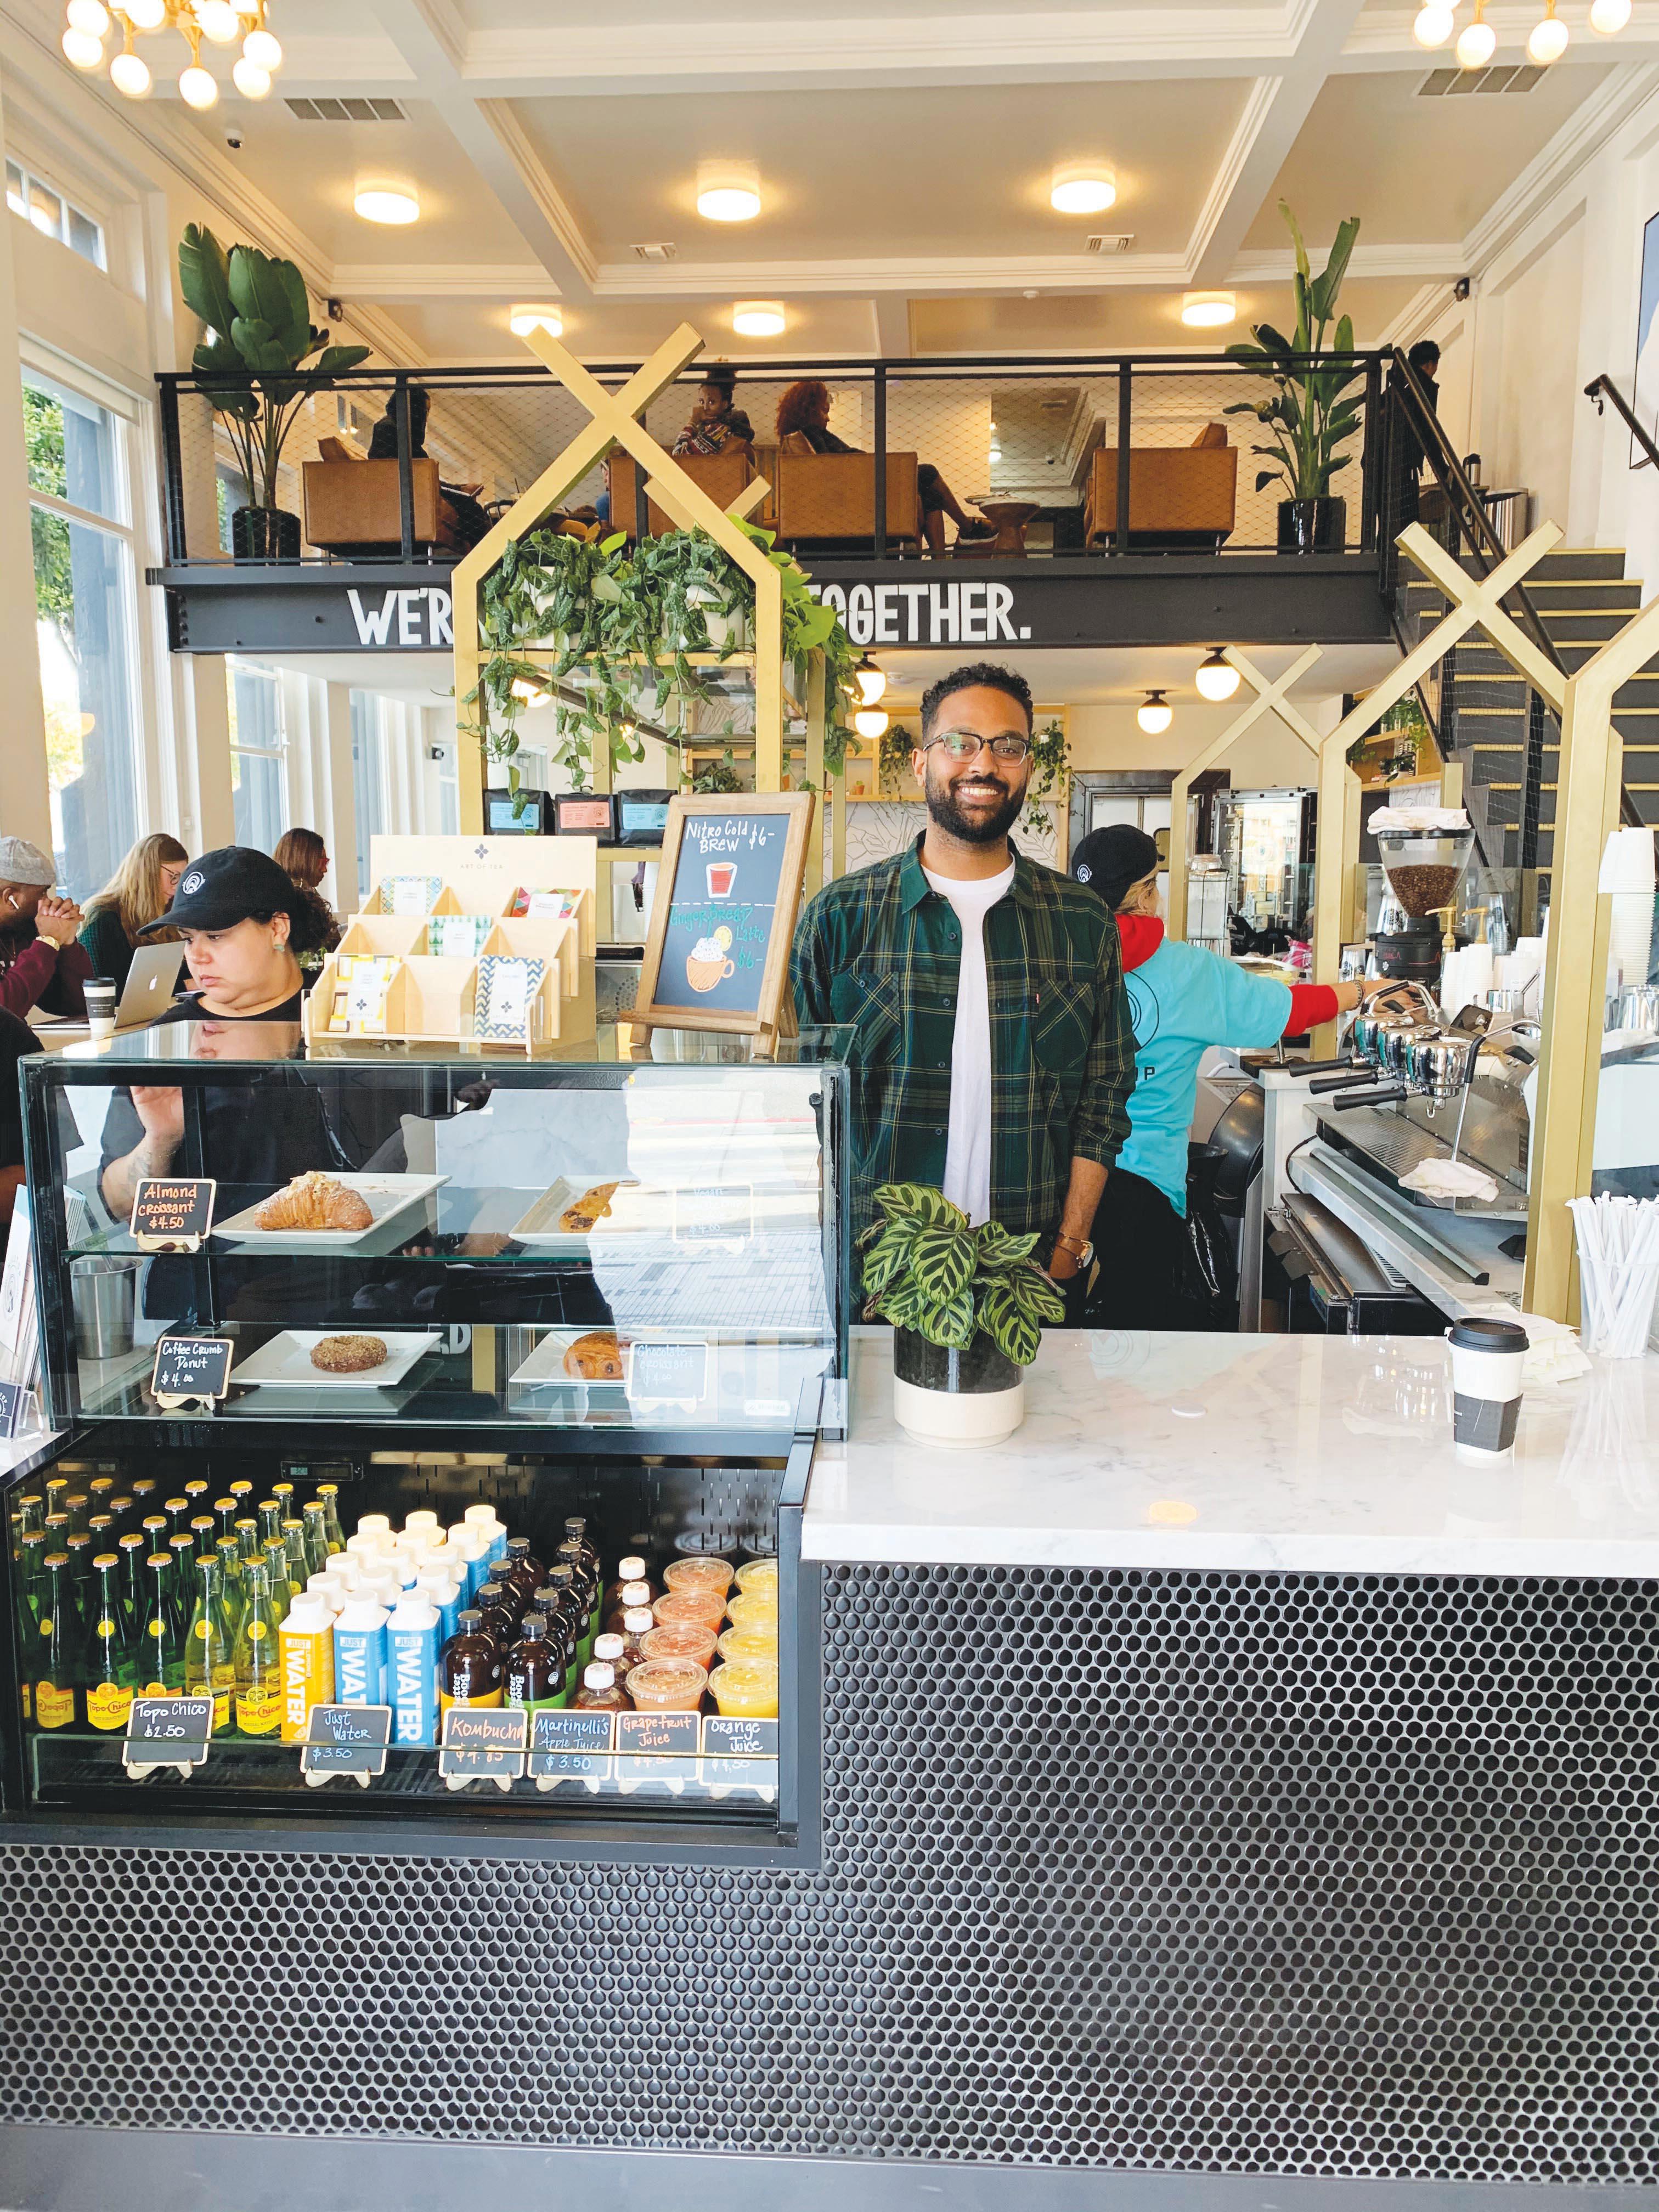 Hilltop Coffee Kitchen Inglewood S Latest Downtown Establishment Inglewood Today News